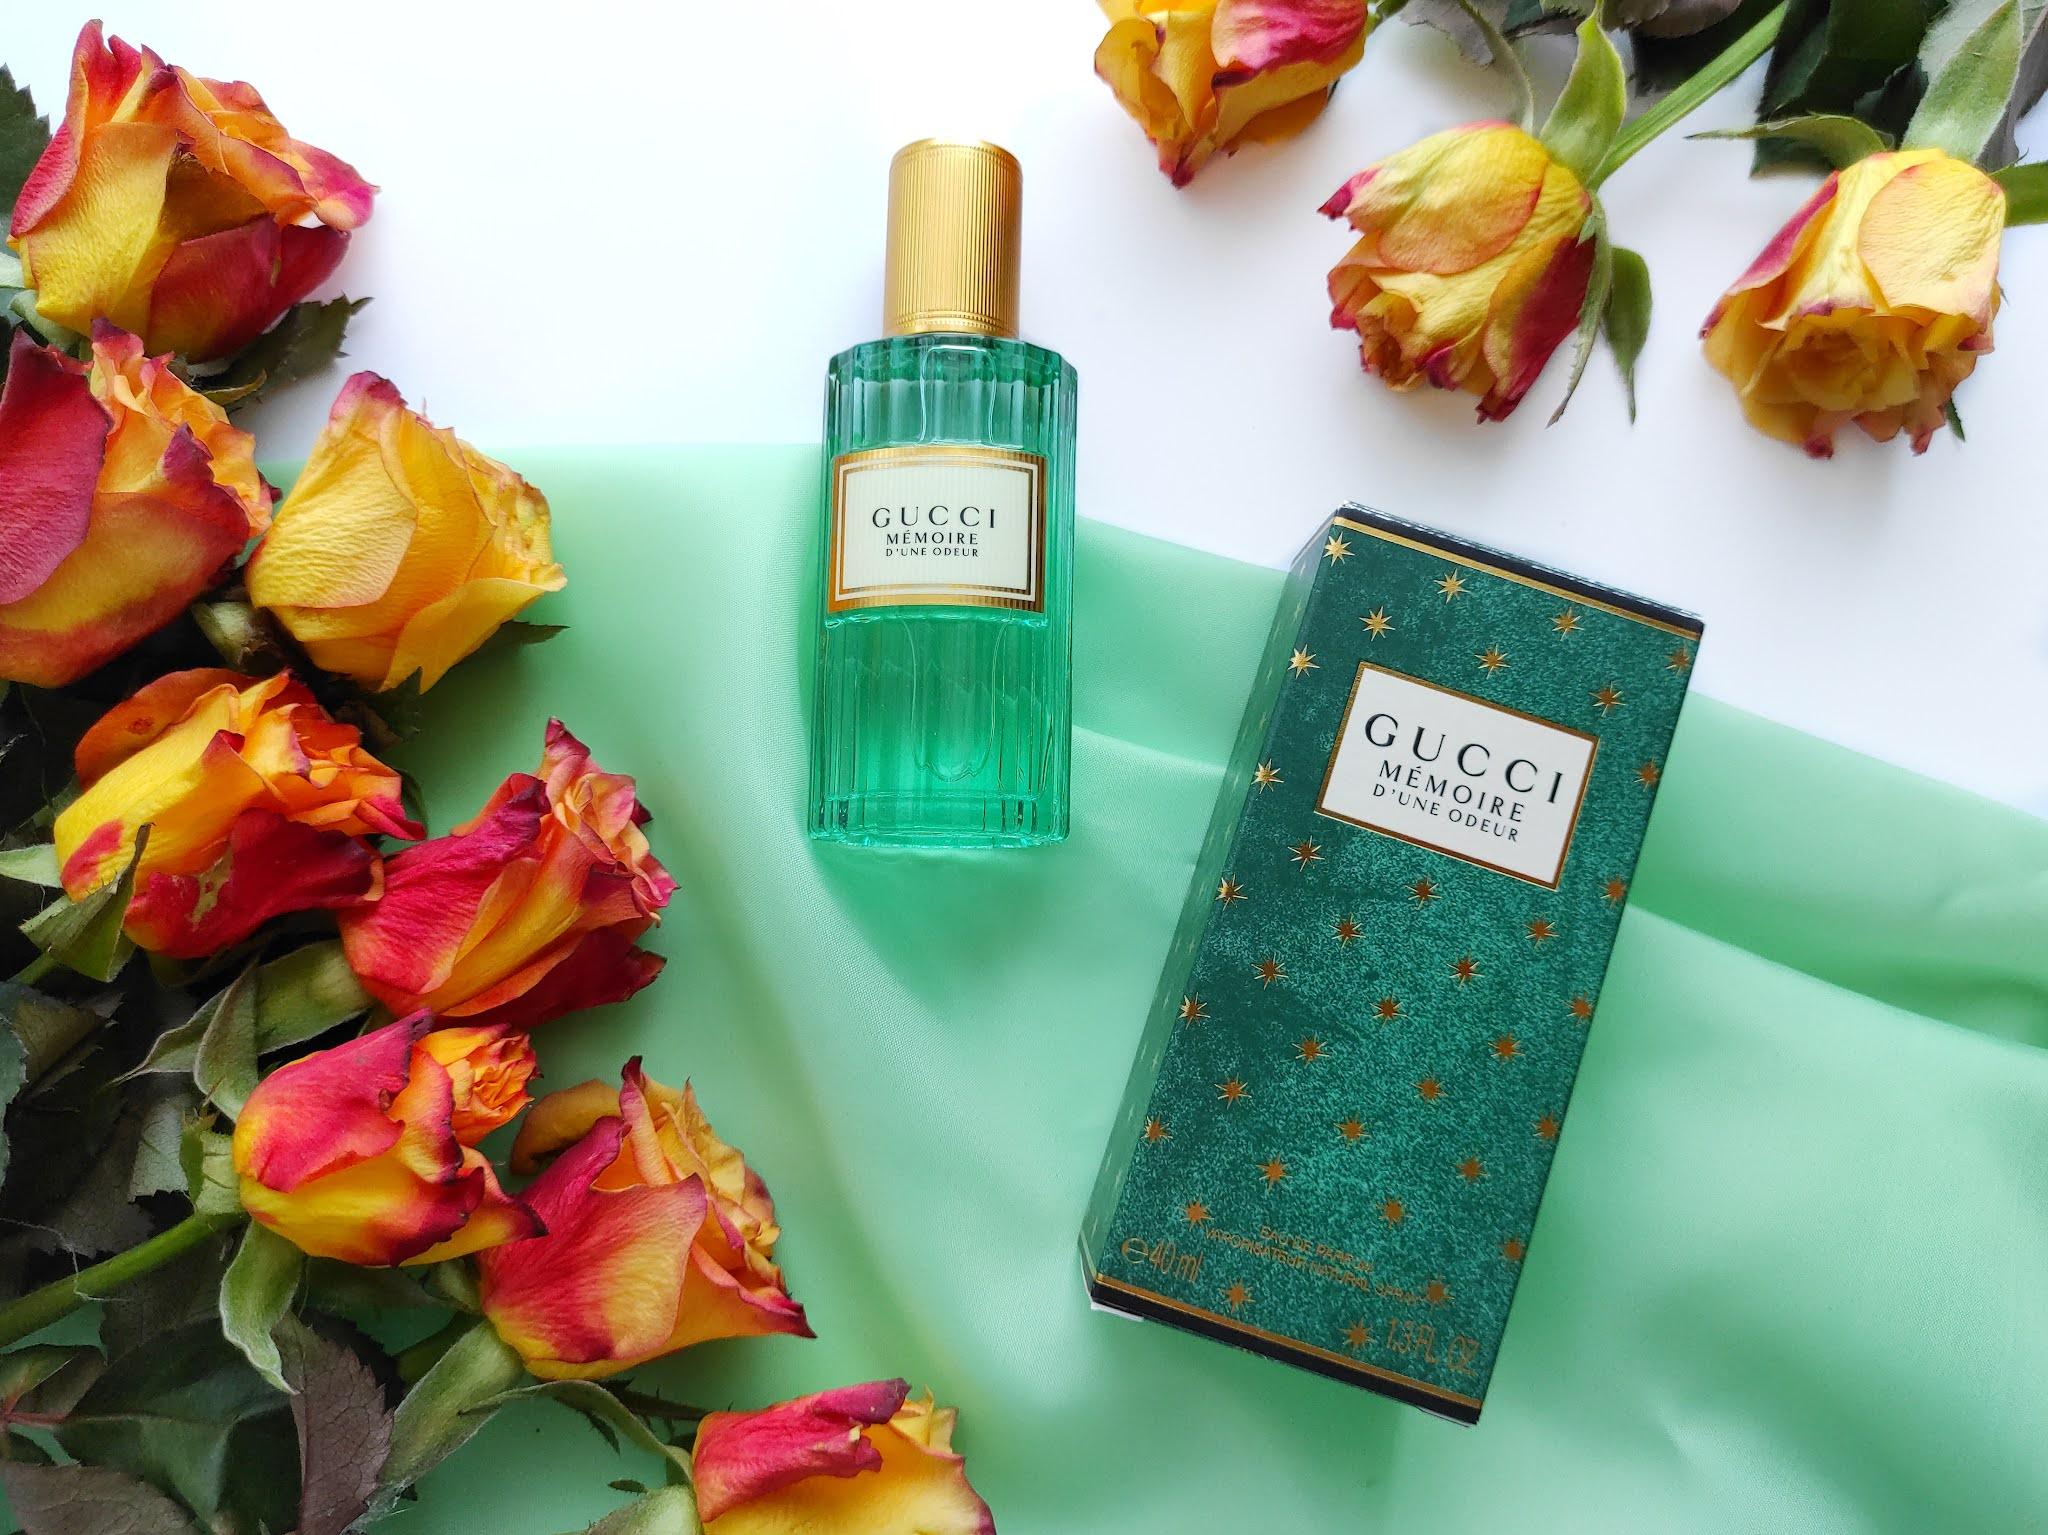 Perfumy Gucci memoire fine odeue